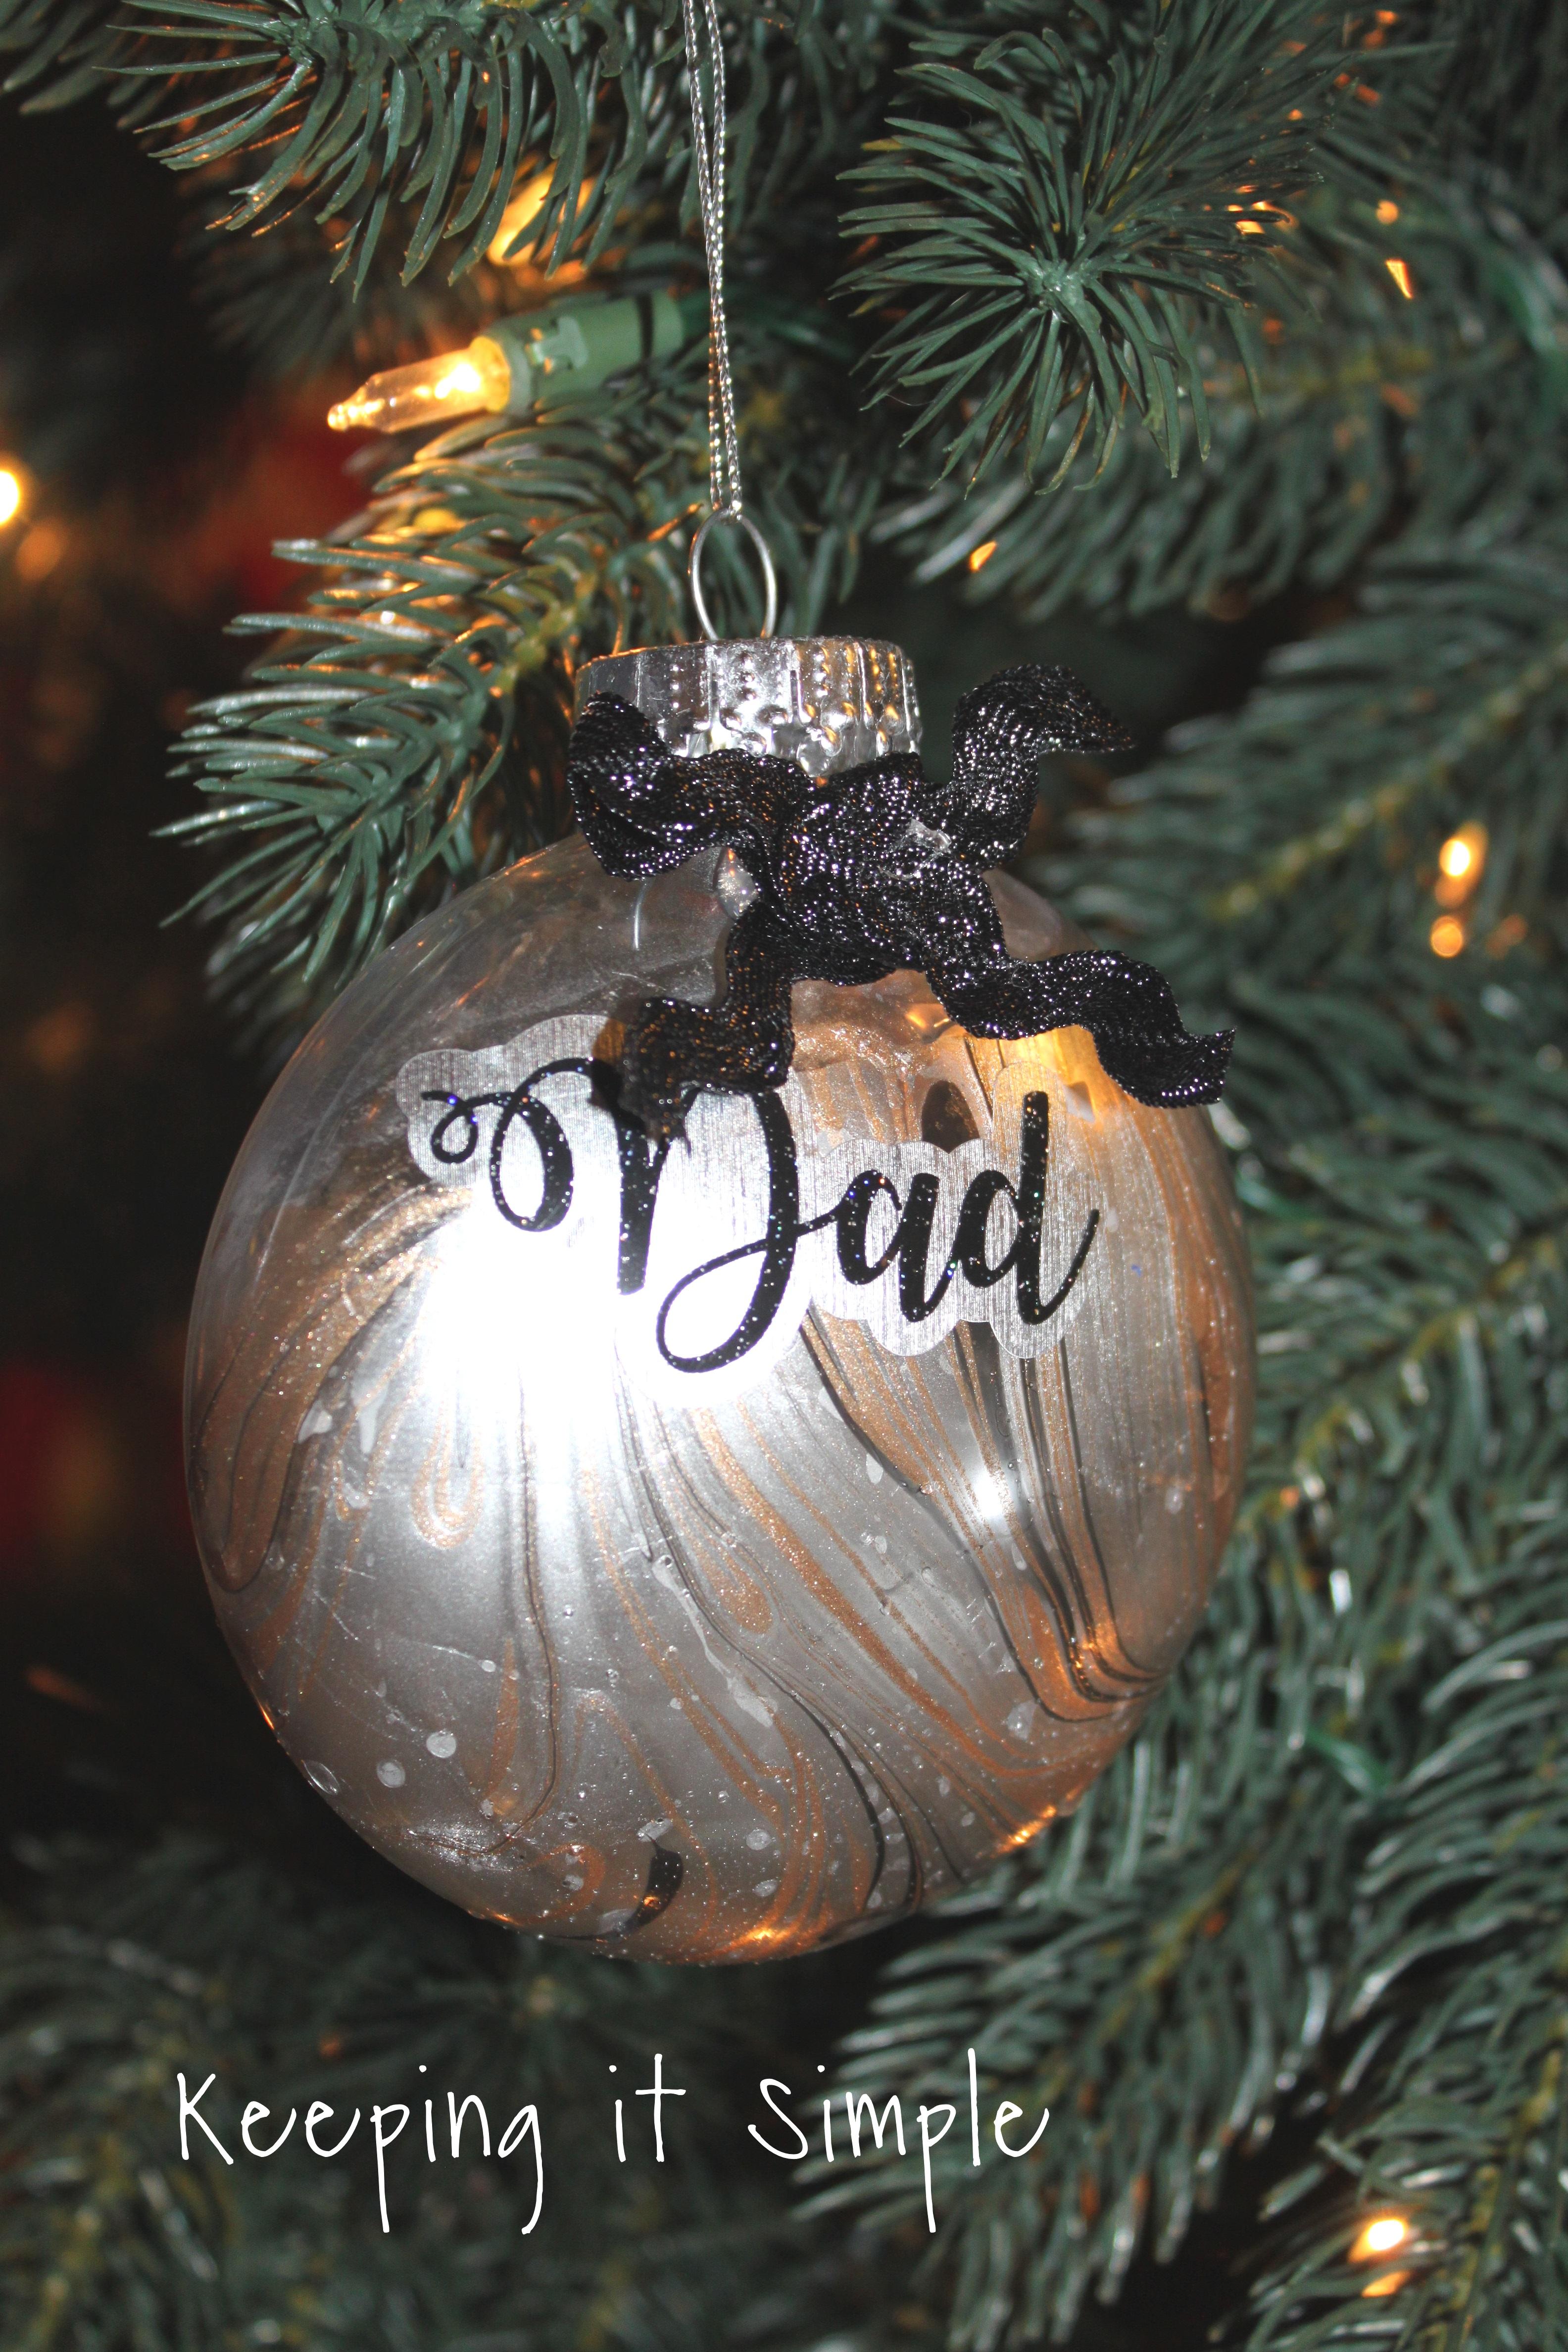 Nail Polish Dipped Christmas Ornament 2 2 Keeping It Simple